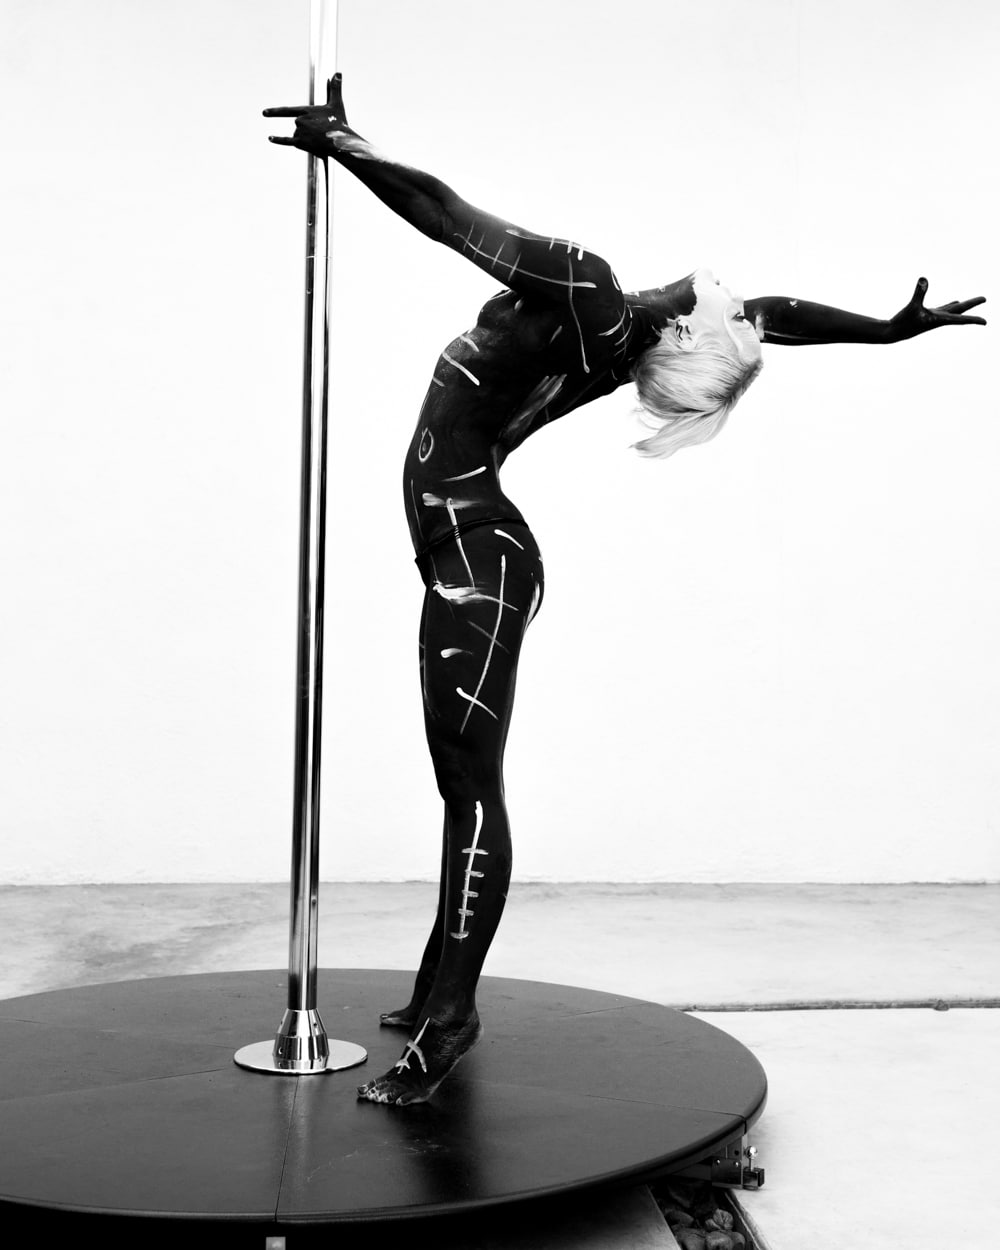 pole_dance_ancient_lines_beylerian_3